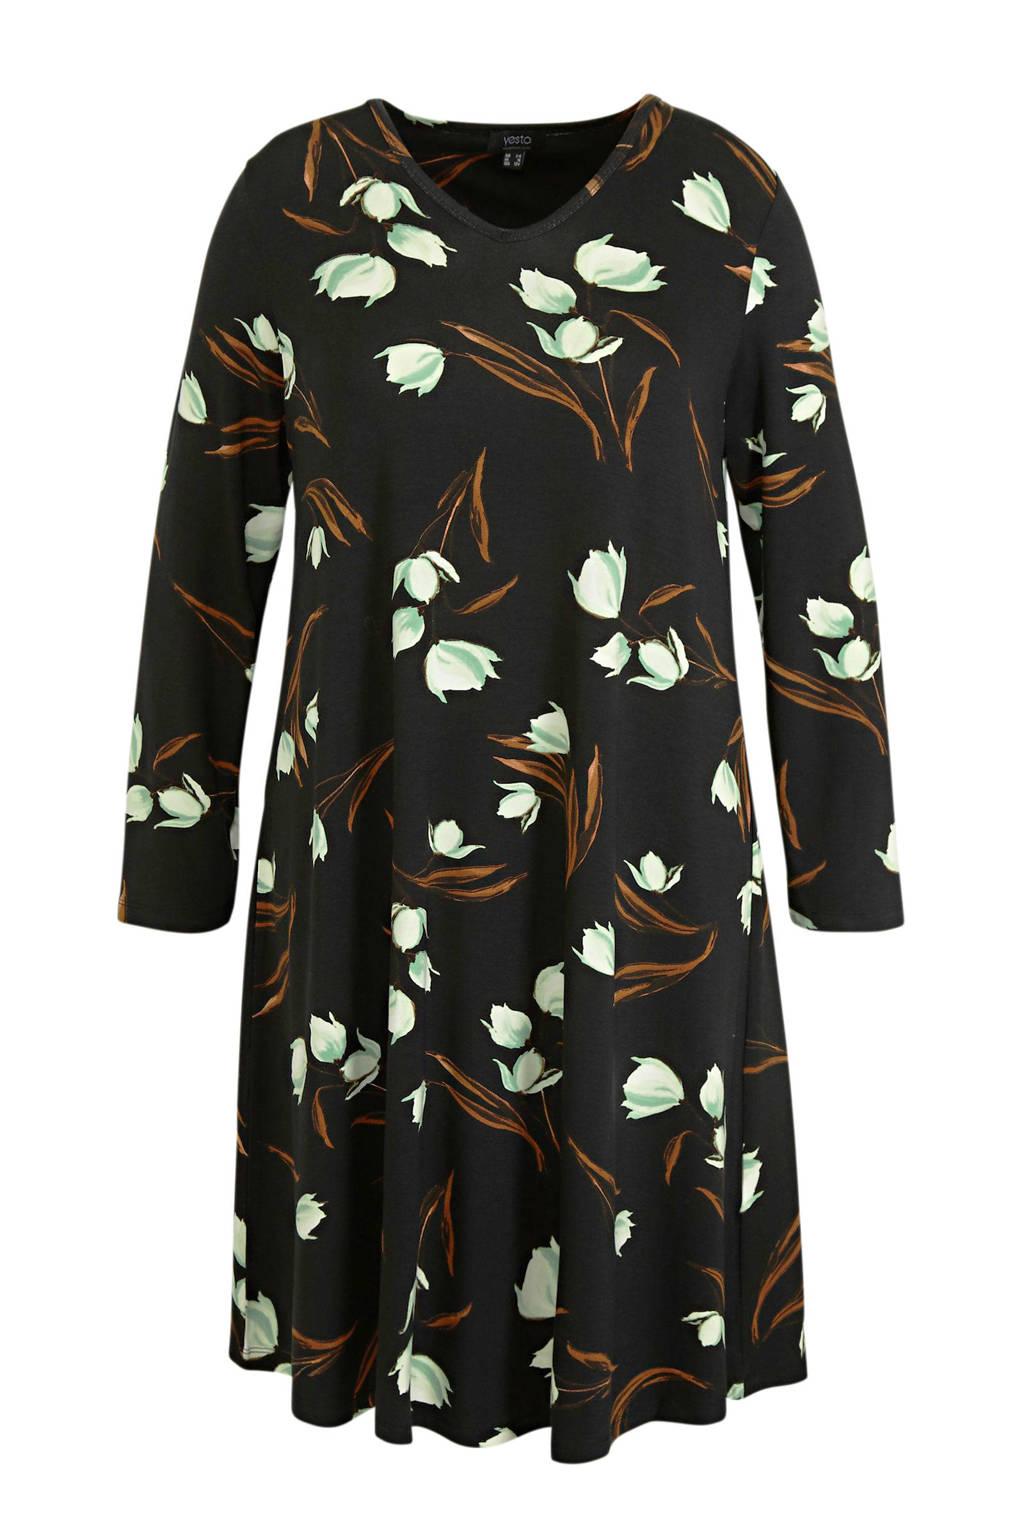 Yesta jurk Amalie Essential met all over print zwart/mintgroen/bruin, Zwart/mintgroen/bruin